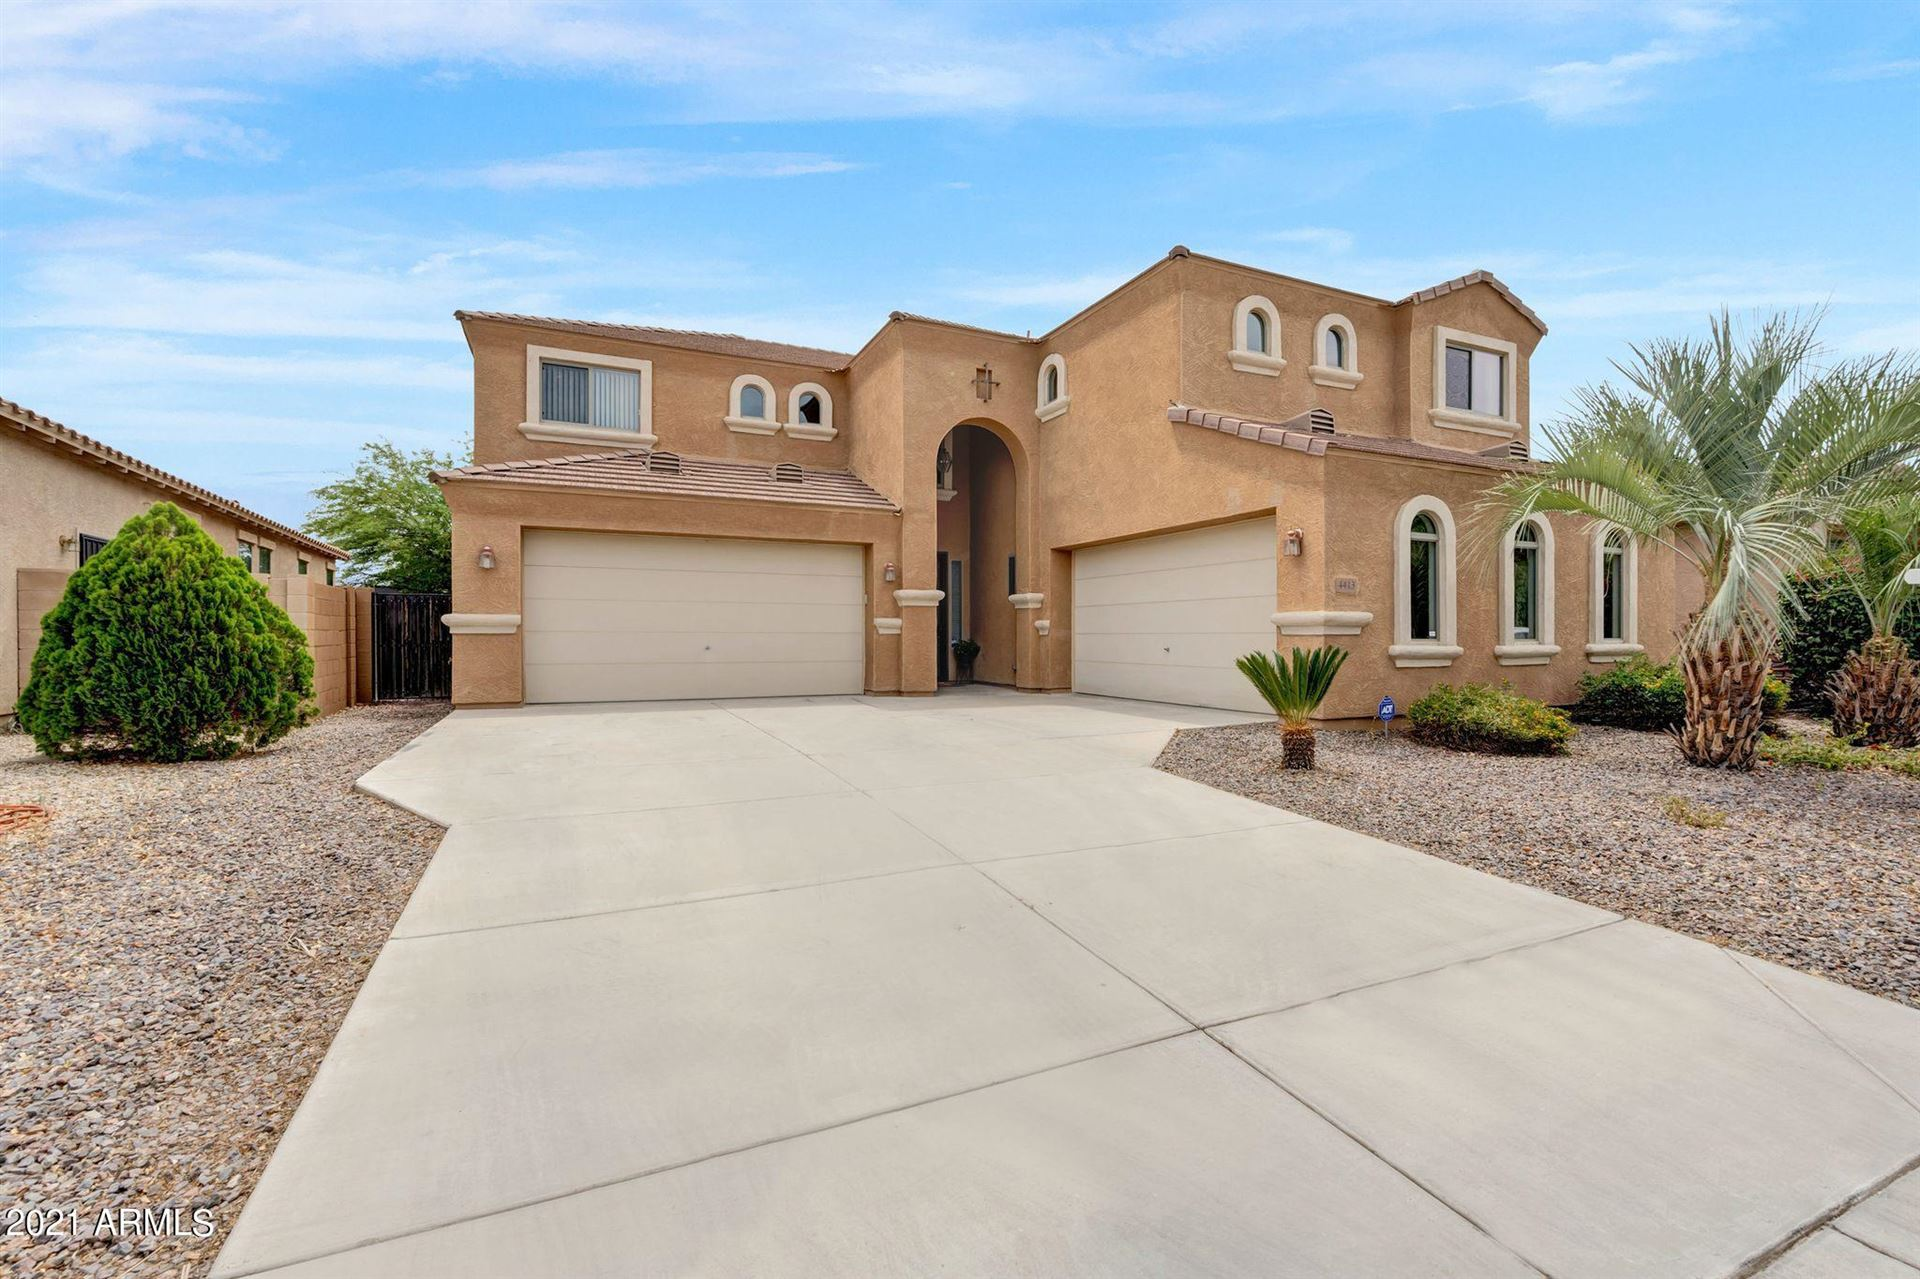 Photo of 4413 E ODESSA Drive, San Tan Valley, AZ 85140 (MLS # 6231855)